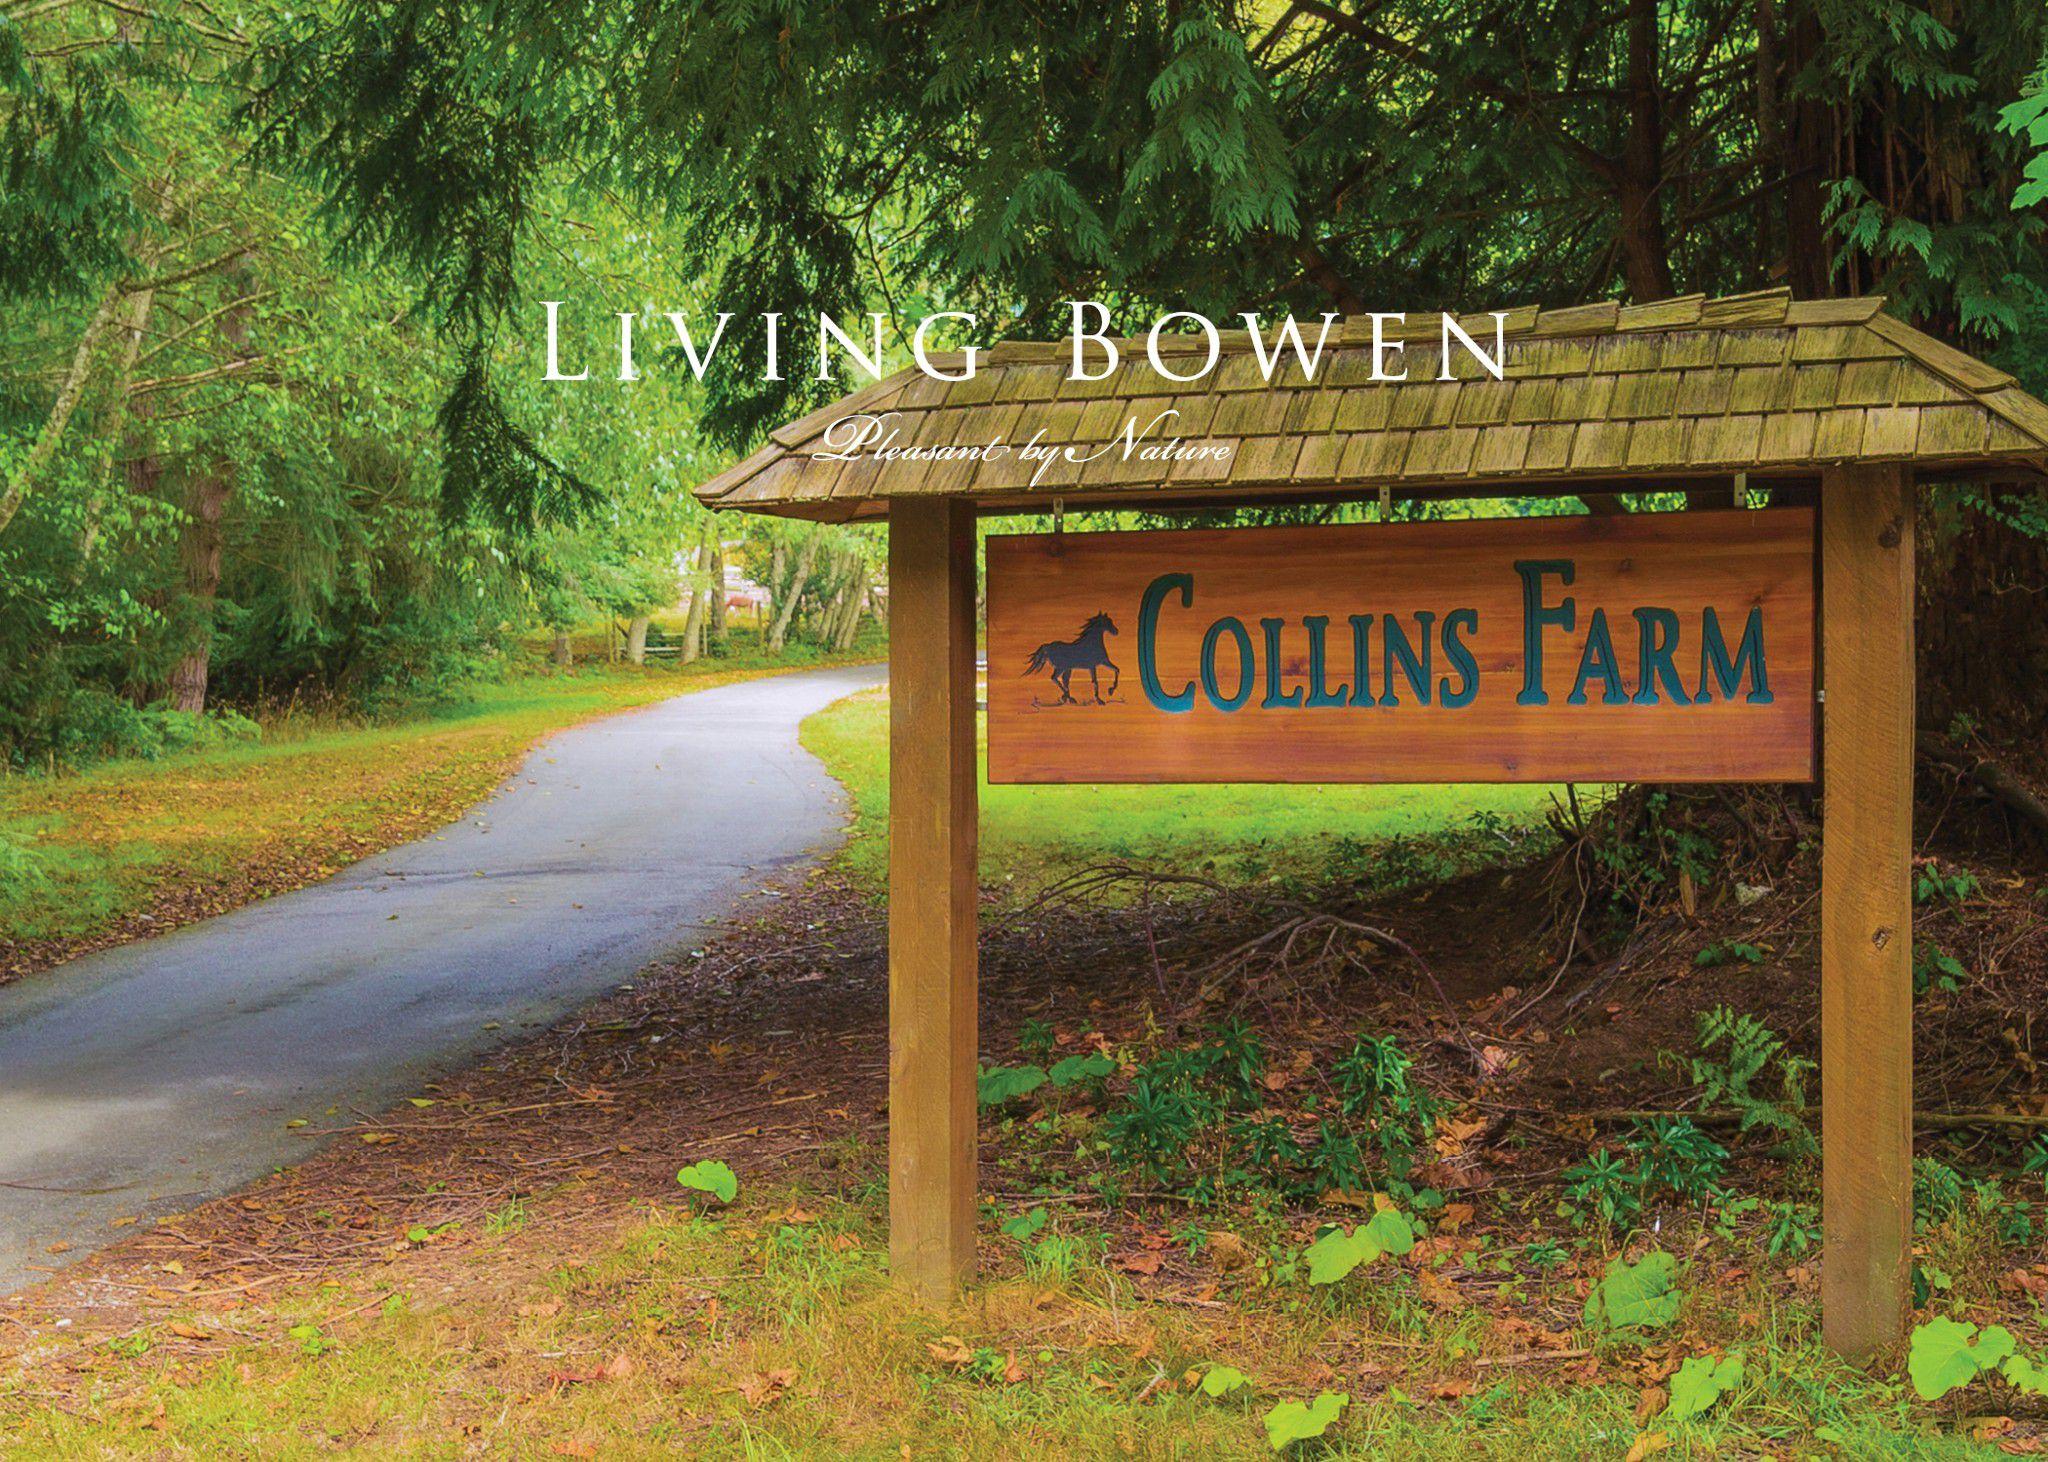 Main Photo: 456 Collins Farm Road in Bowen Island: Collins Farm House for sale : MLS®# R2240881